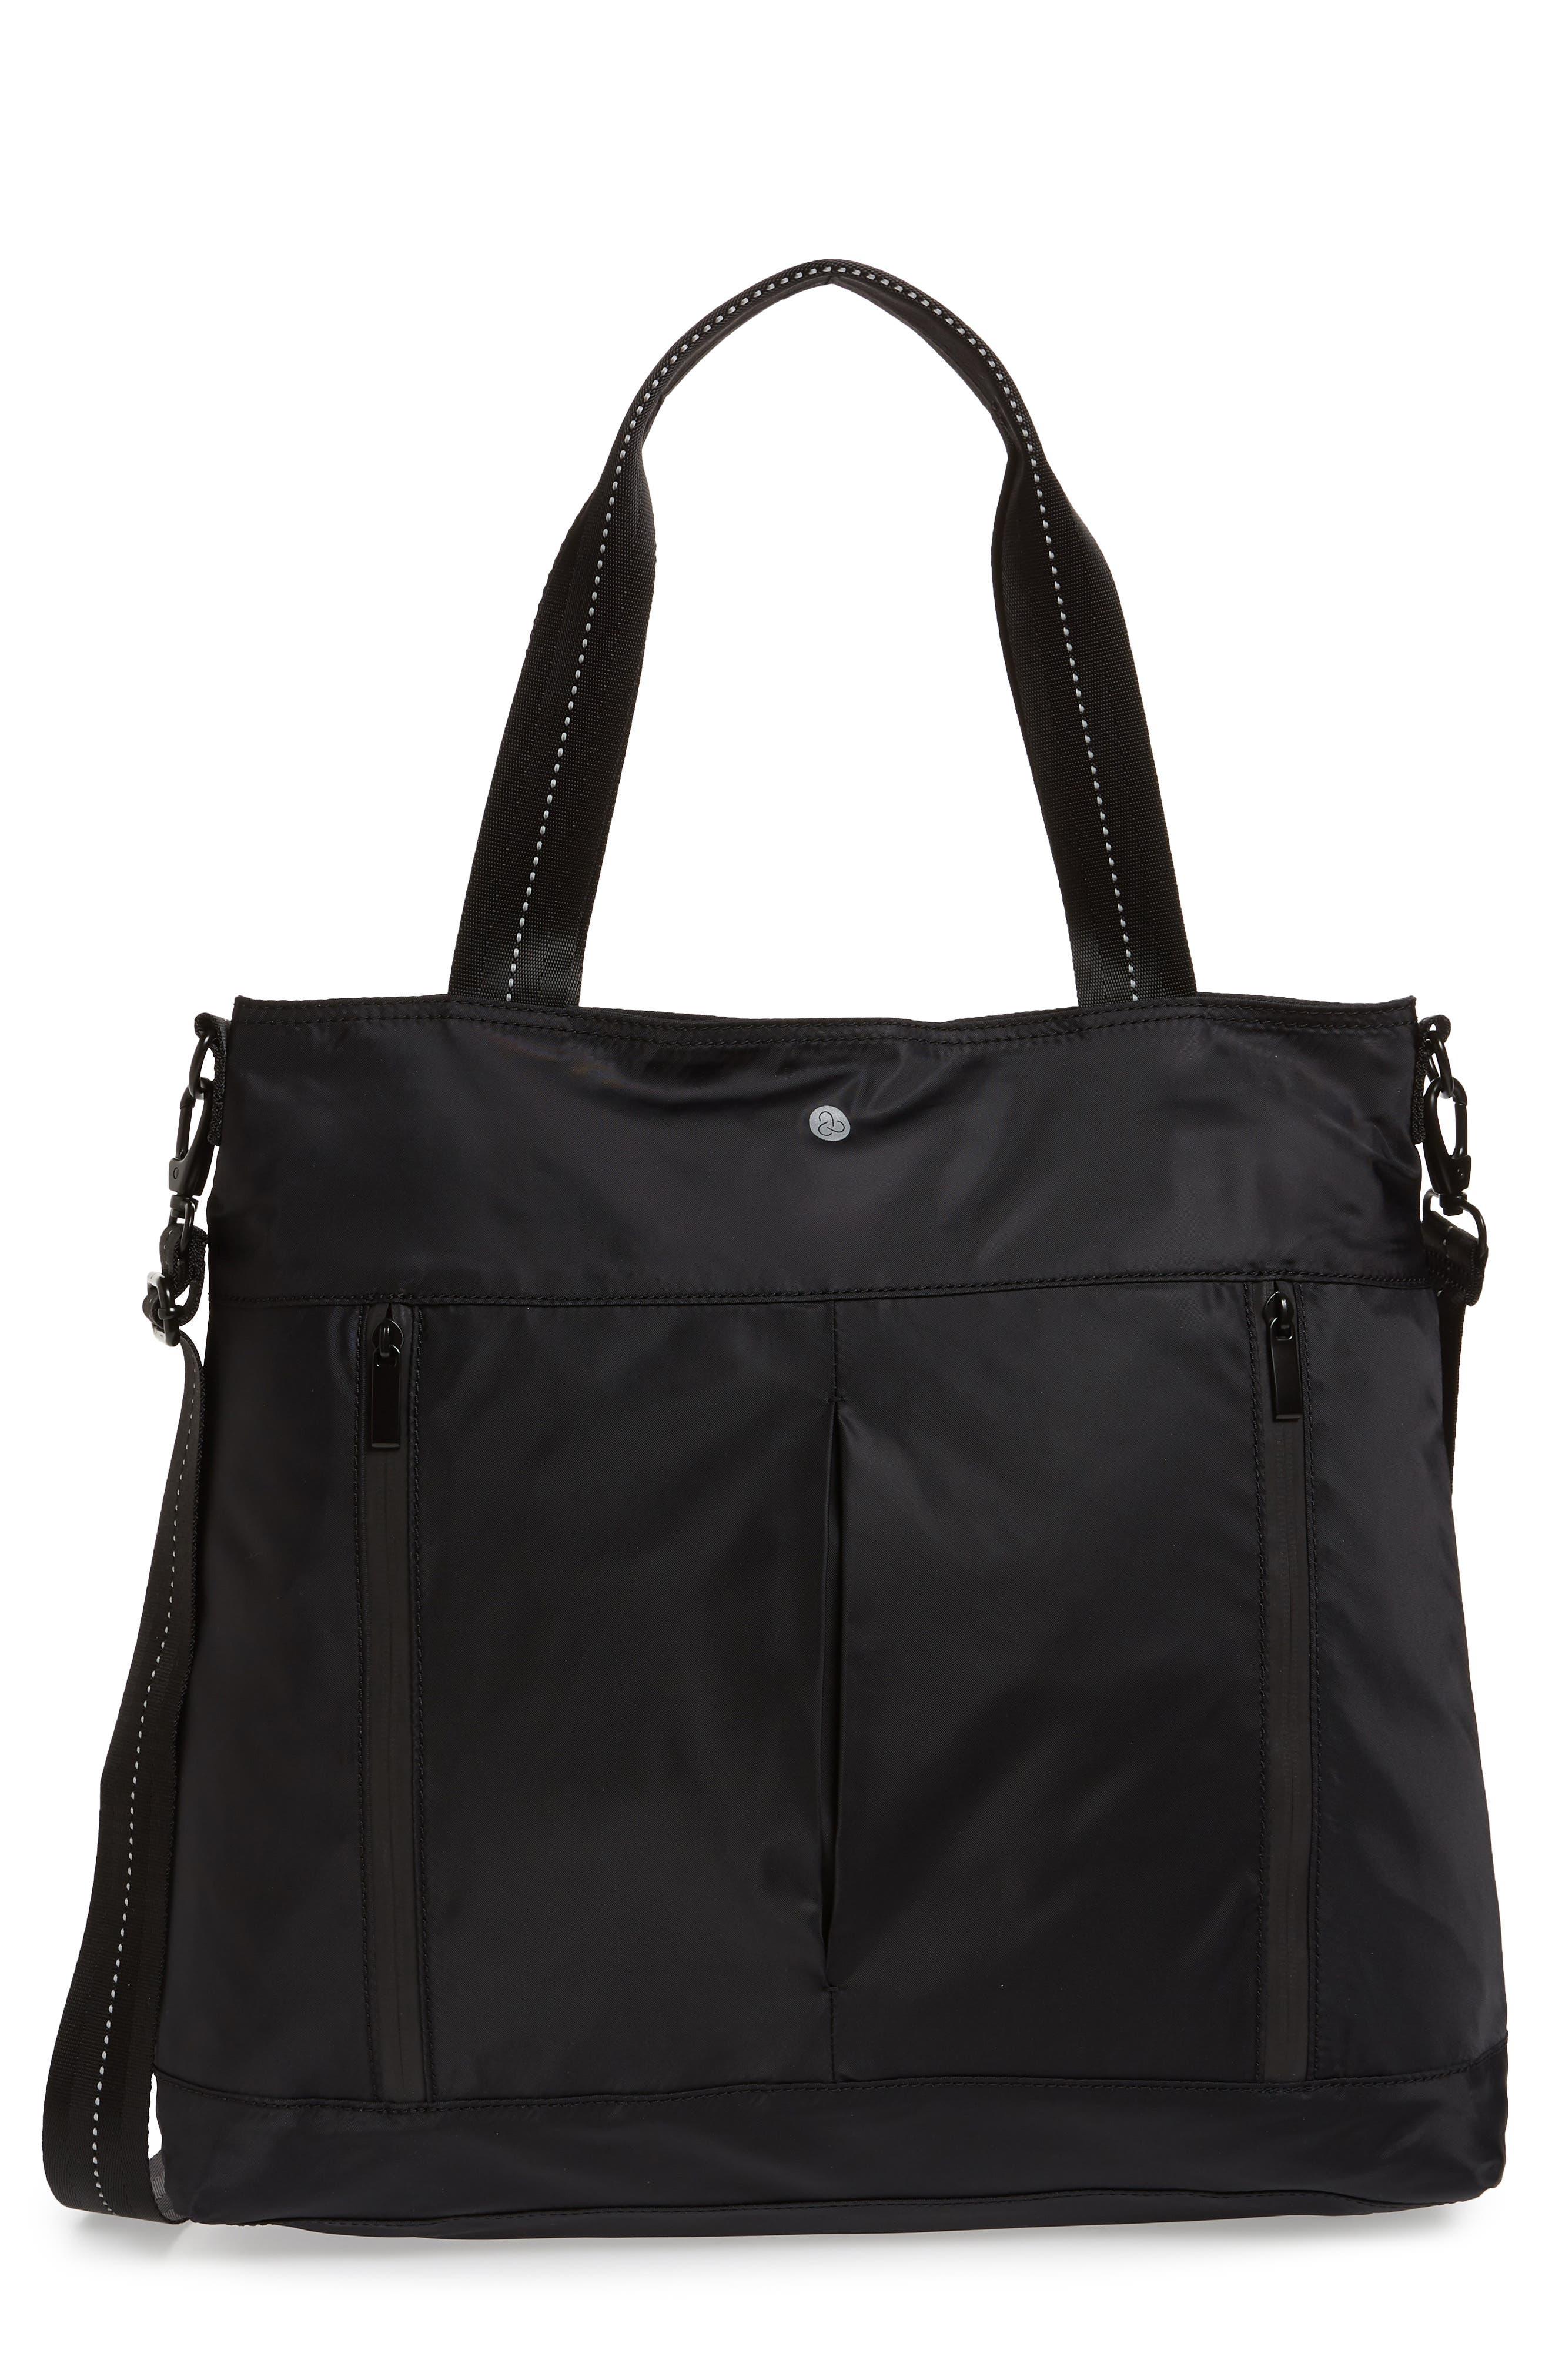 ZELLA Reflective Nylon Tote Bag, Main, color, BLACK